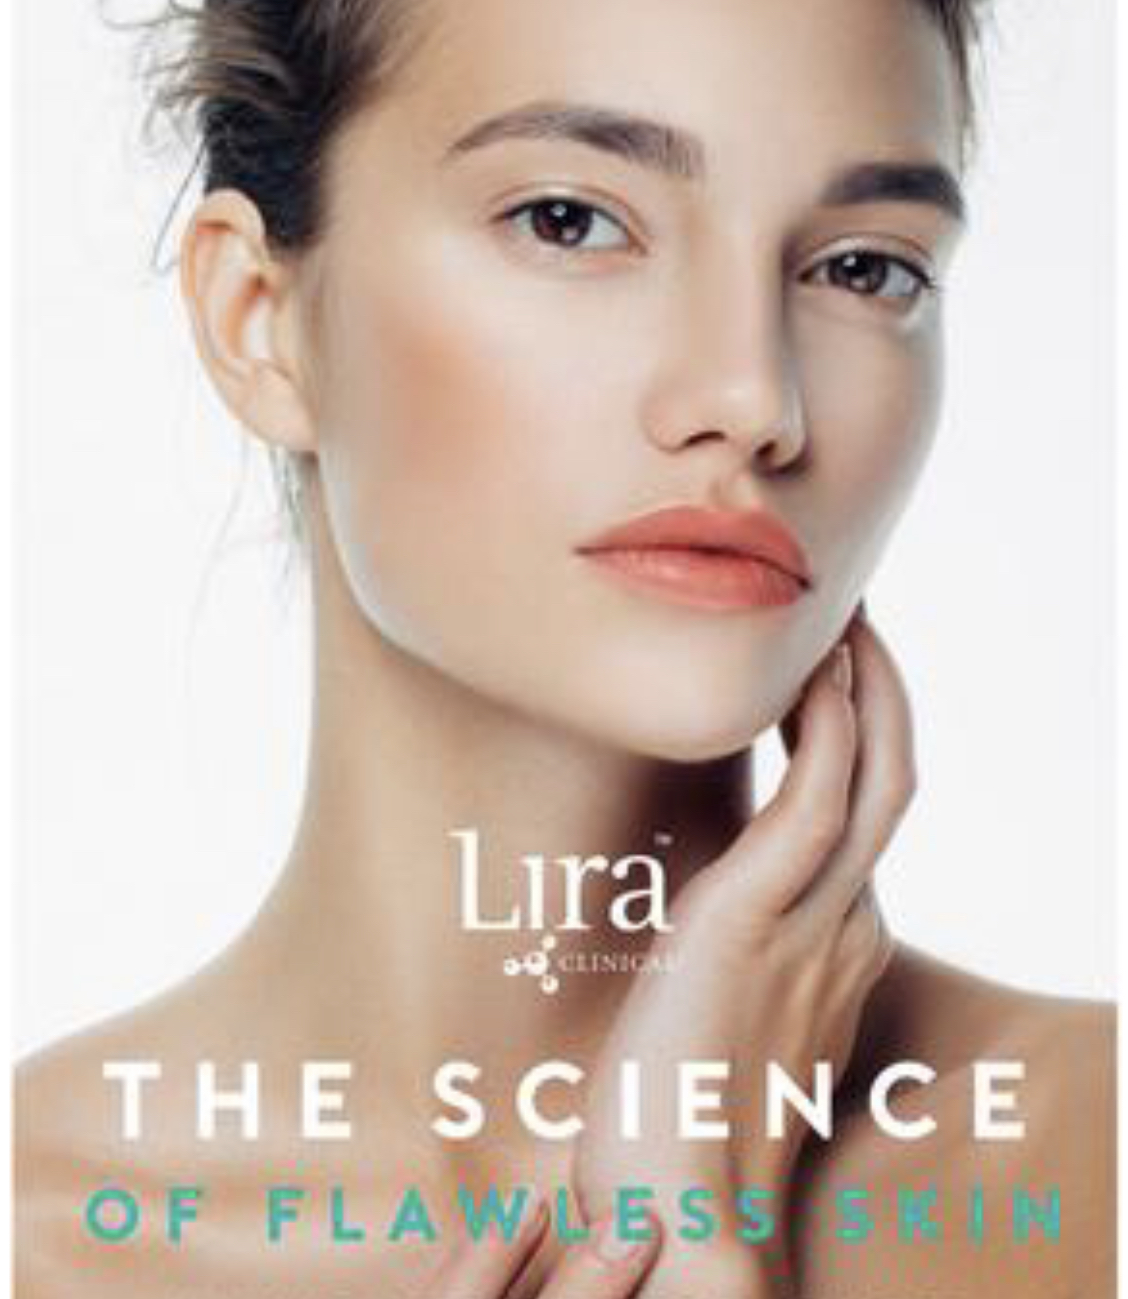 Lira The Science